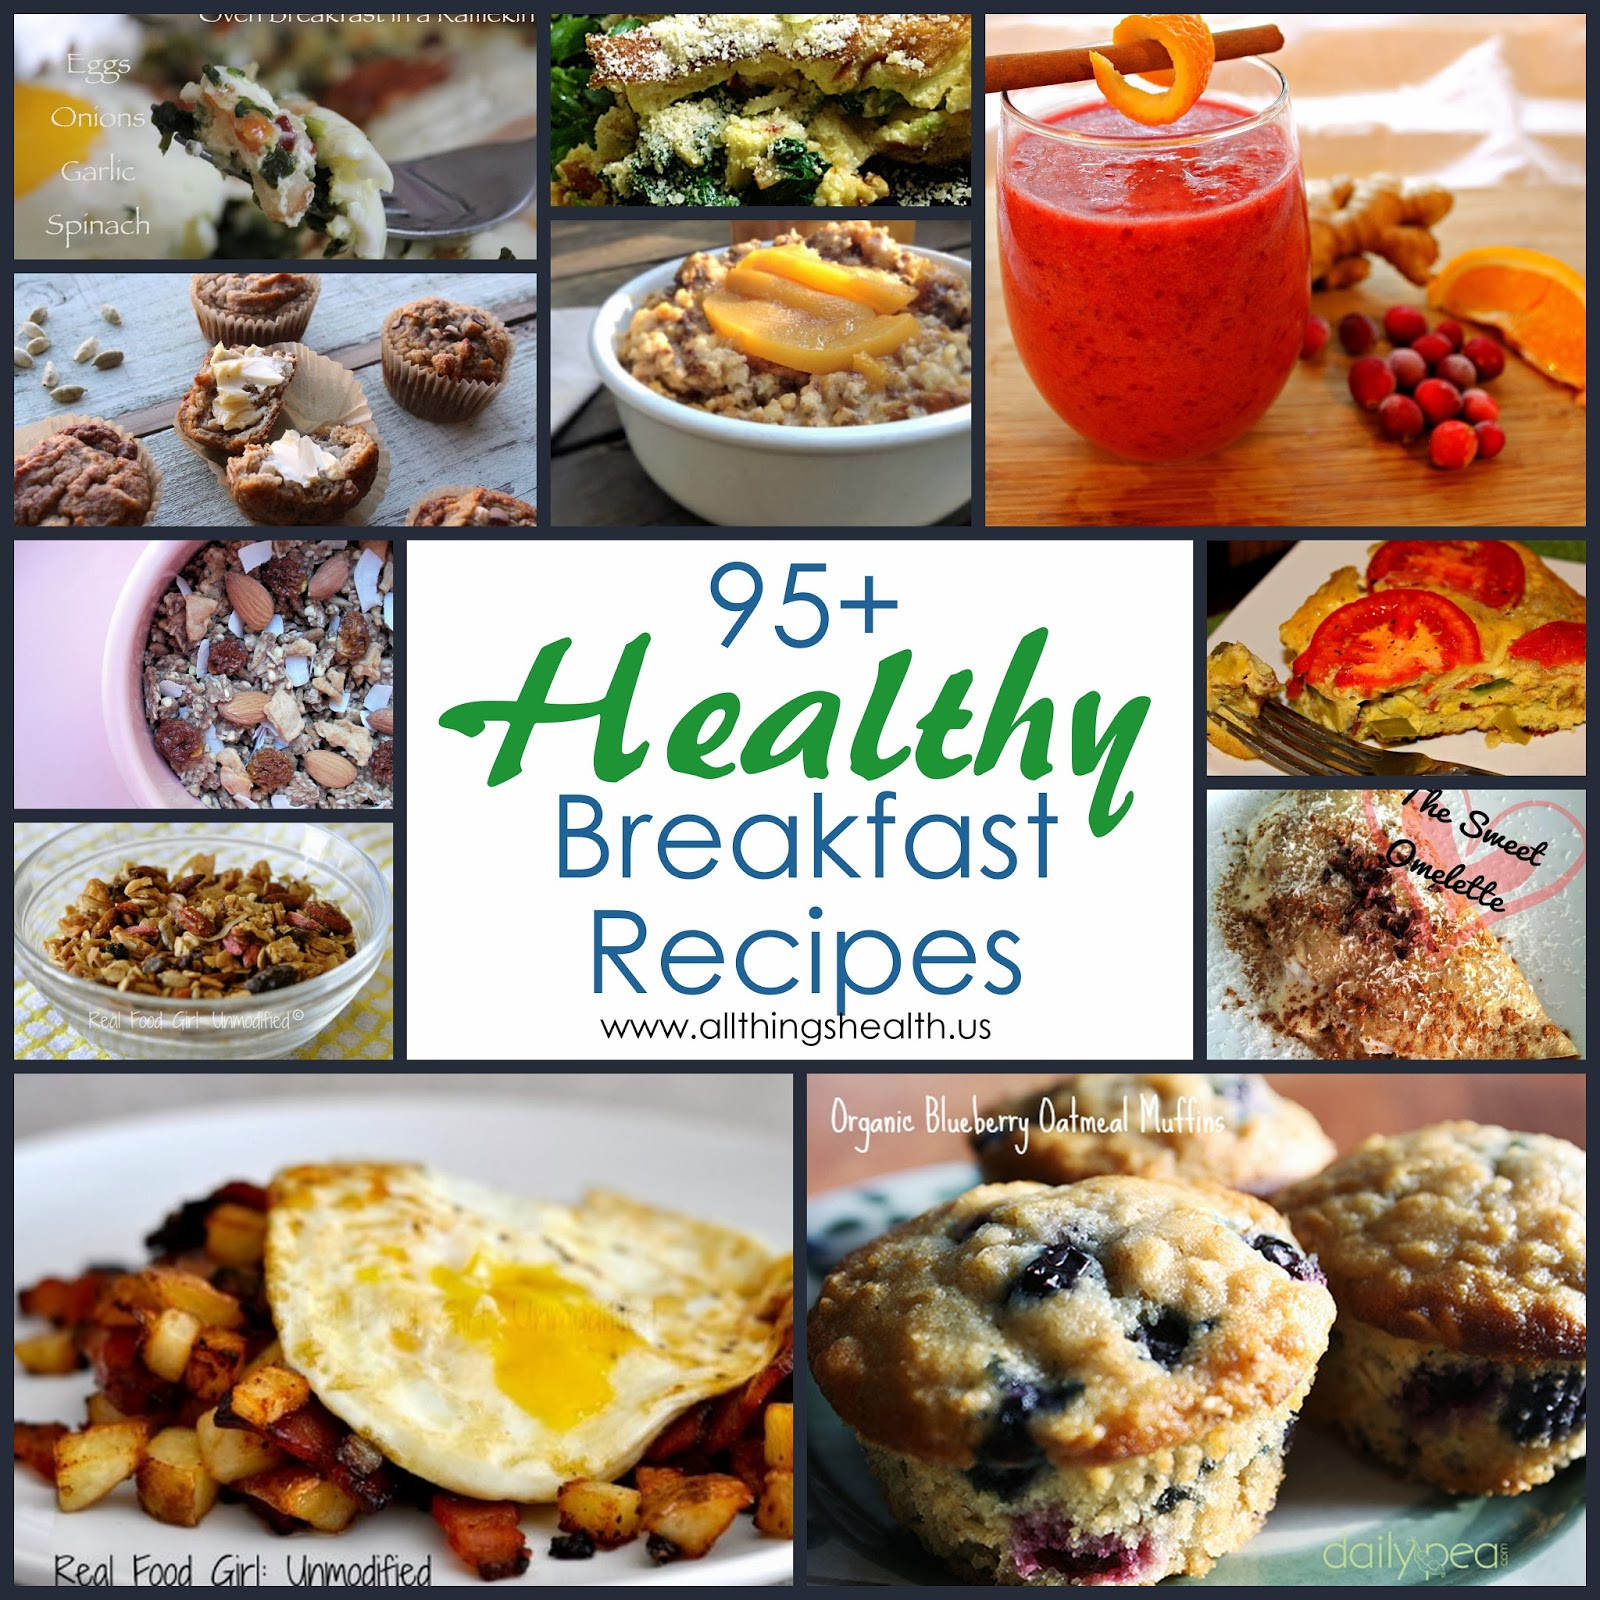 Breakfast Healthy Recipes  All Things Health 95 Healthy Breakfast Recipes